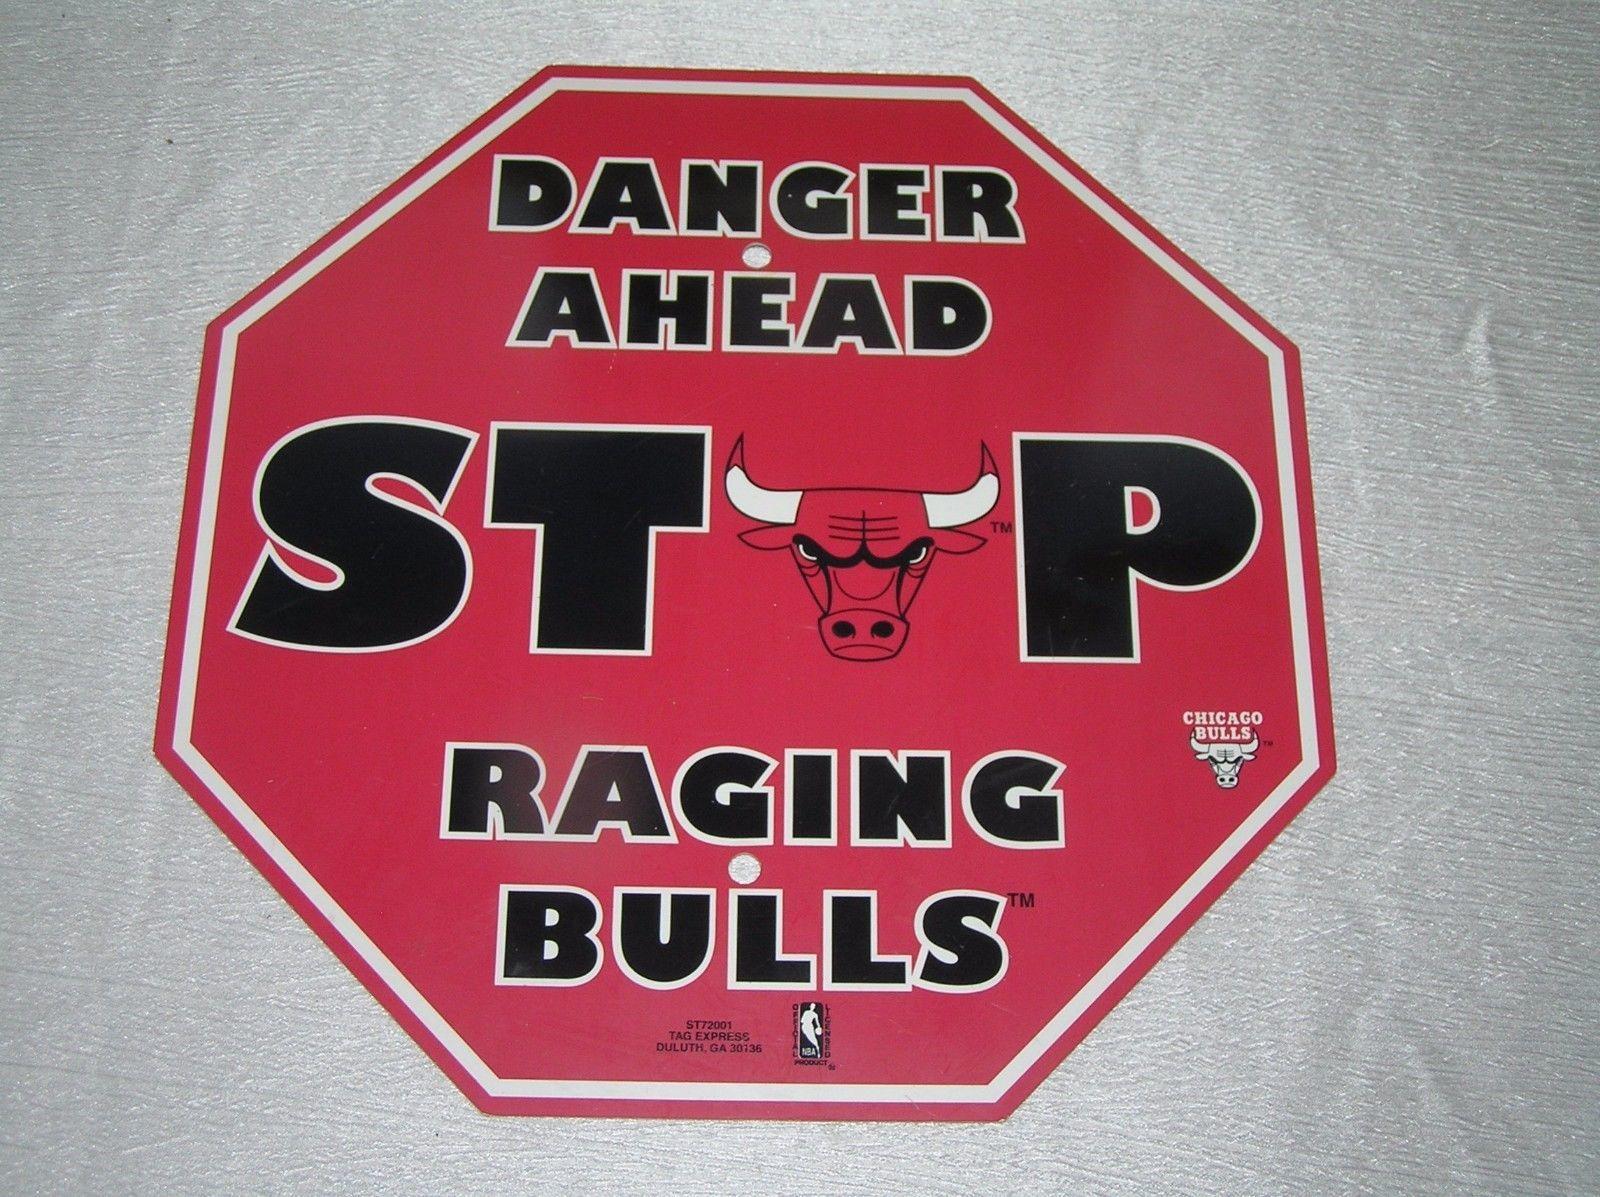 35d39987902 Tag Express Danger Ahead Stop Raging Bulls and 50 similar items